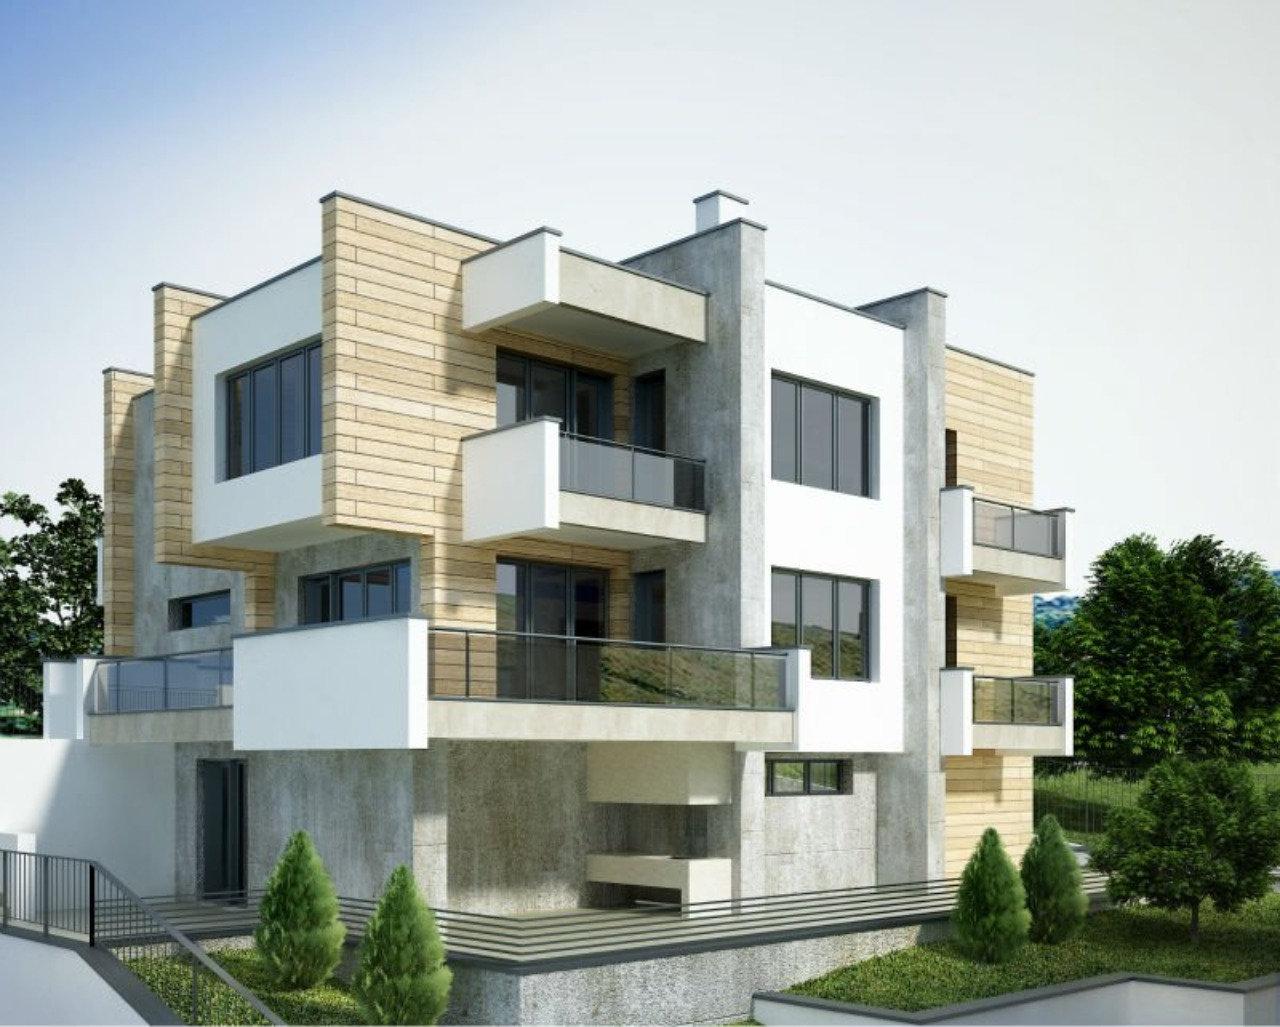 Civil/architectural render